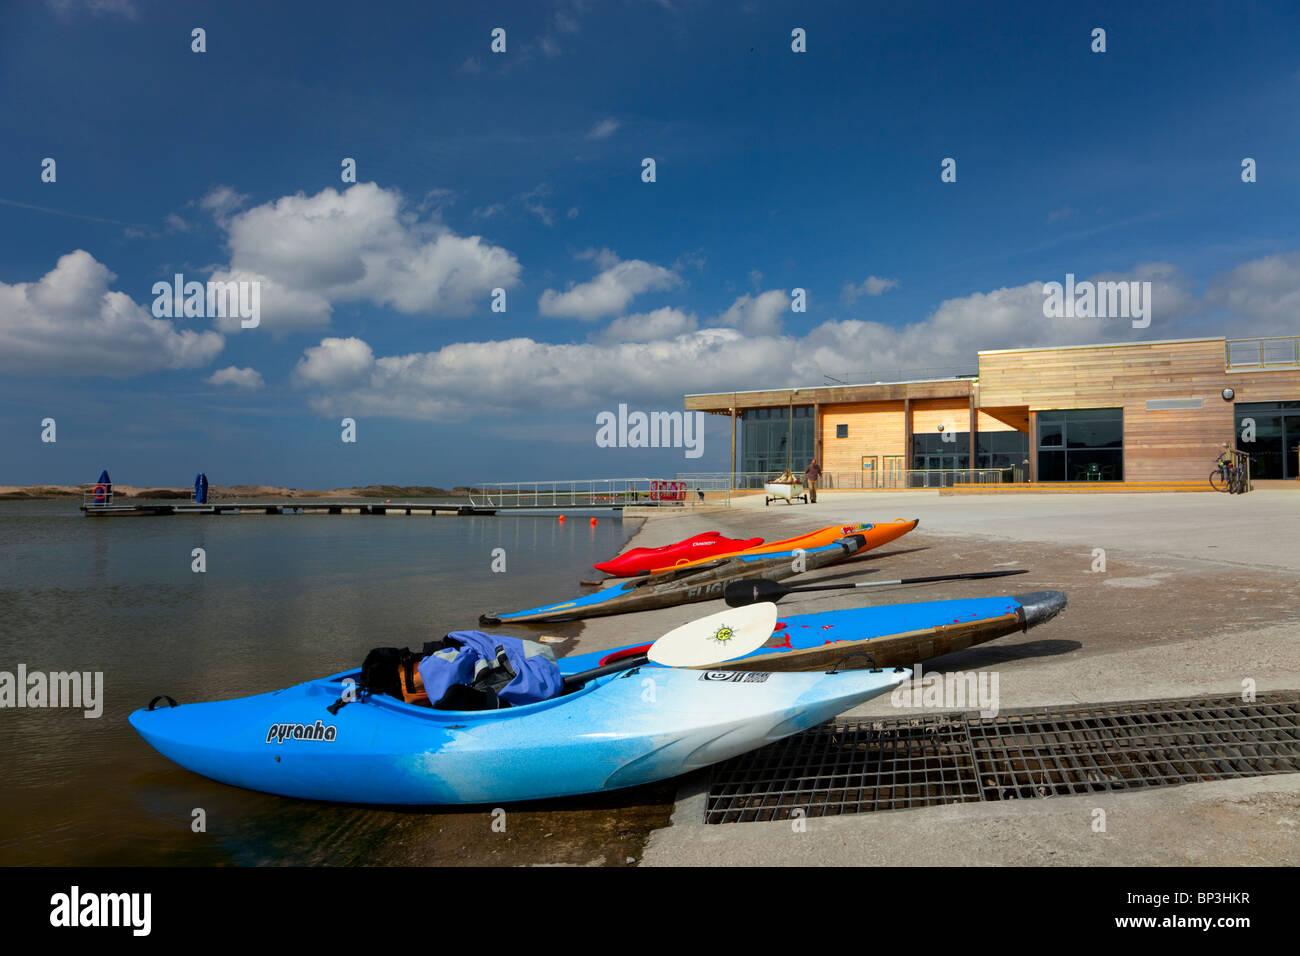 Crosby Lakeside Adventure Centre - Stock Image